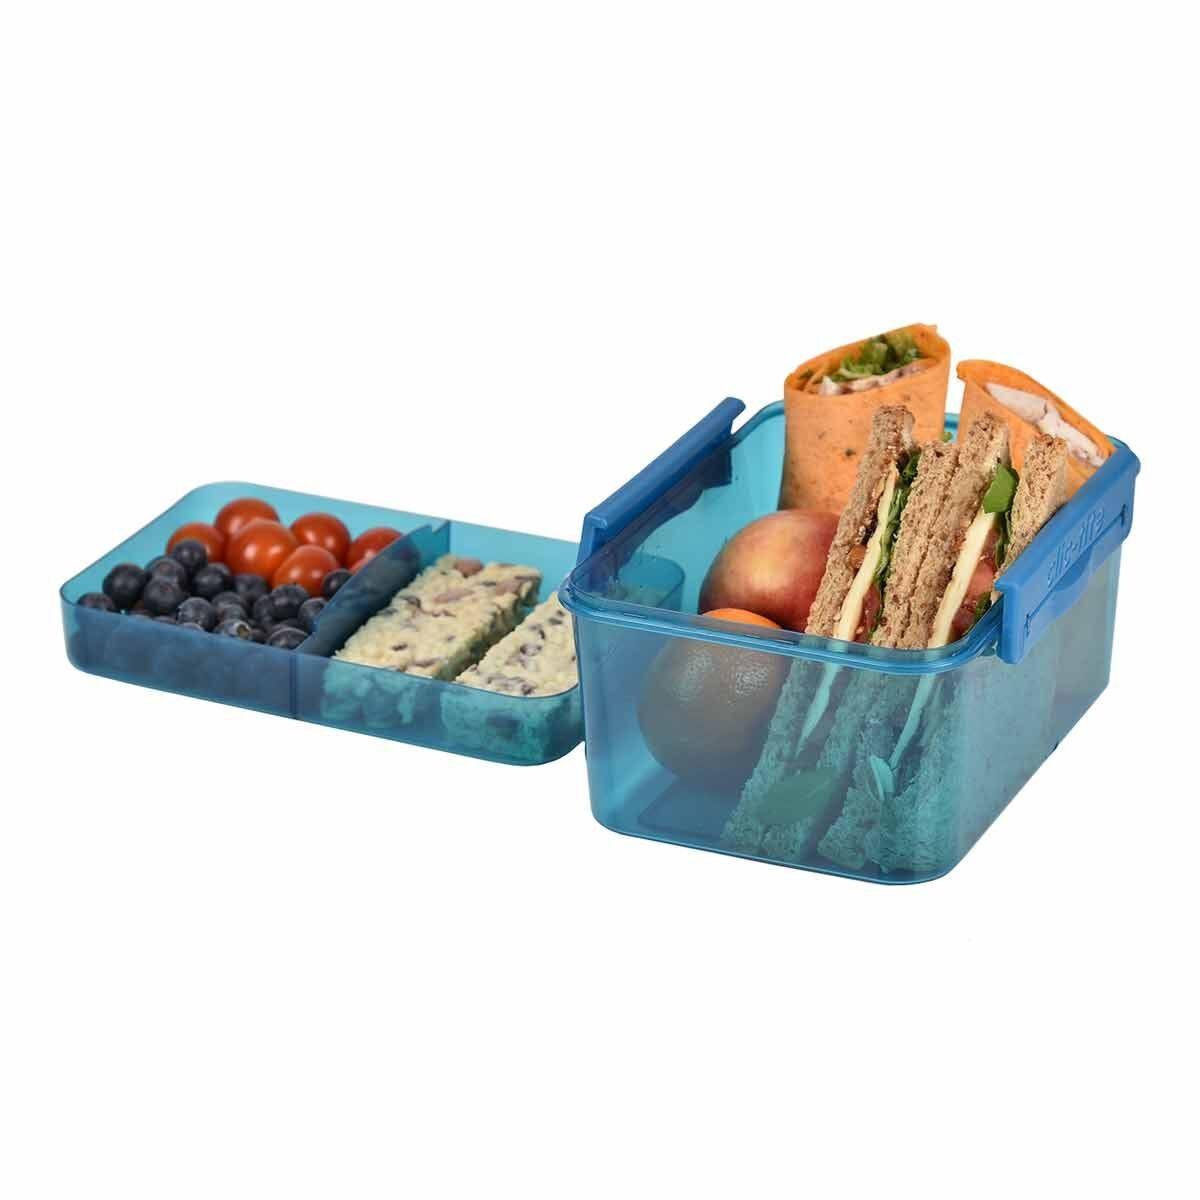 Polar Gear Clic-Tite Double Decker Xl 1.7L Food Container